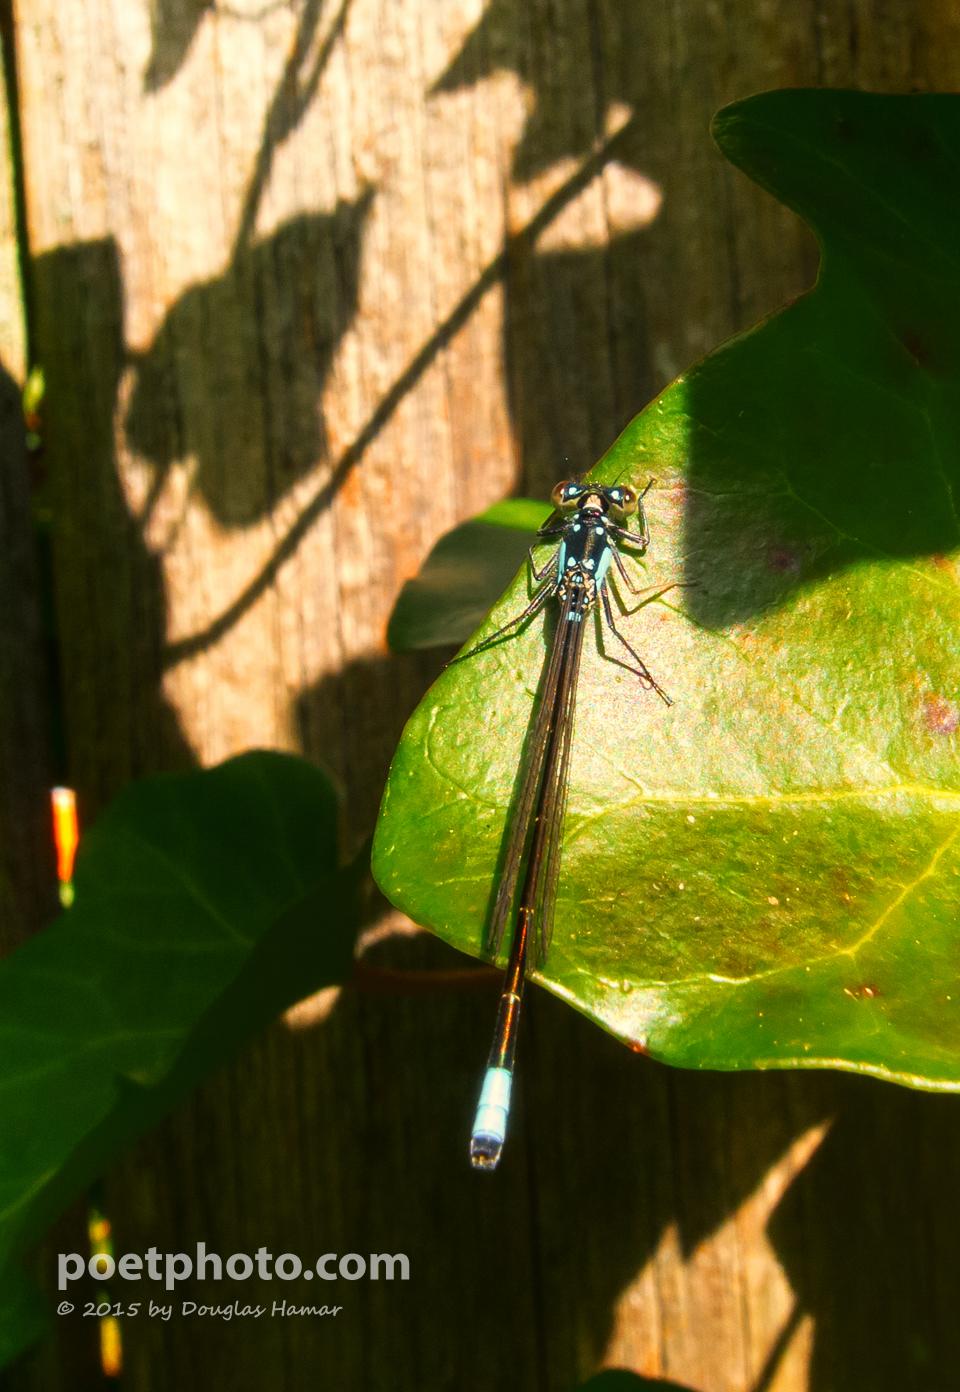 Damsel fly-